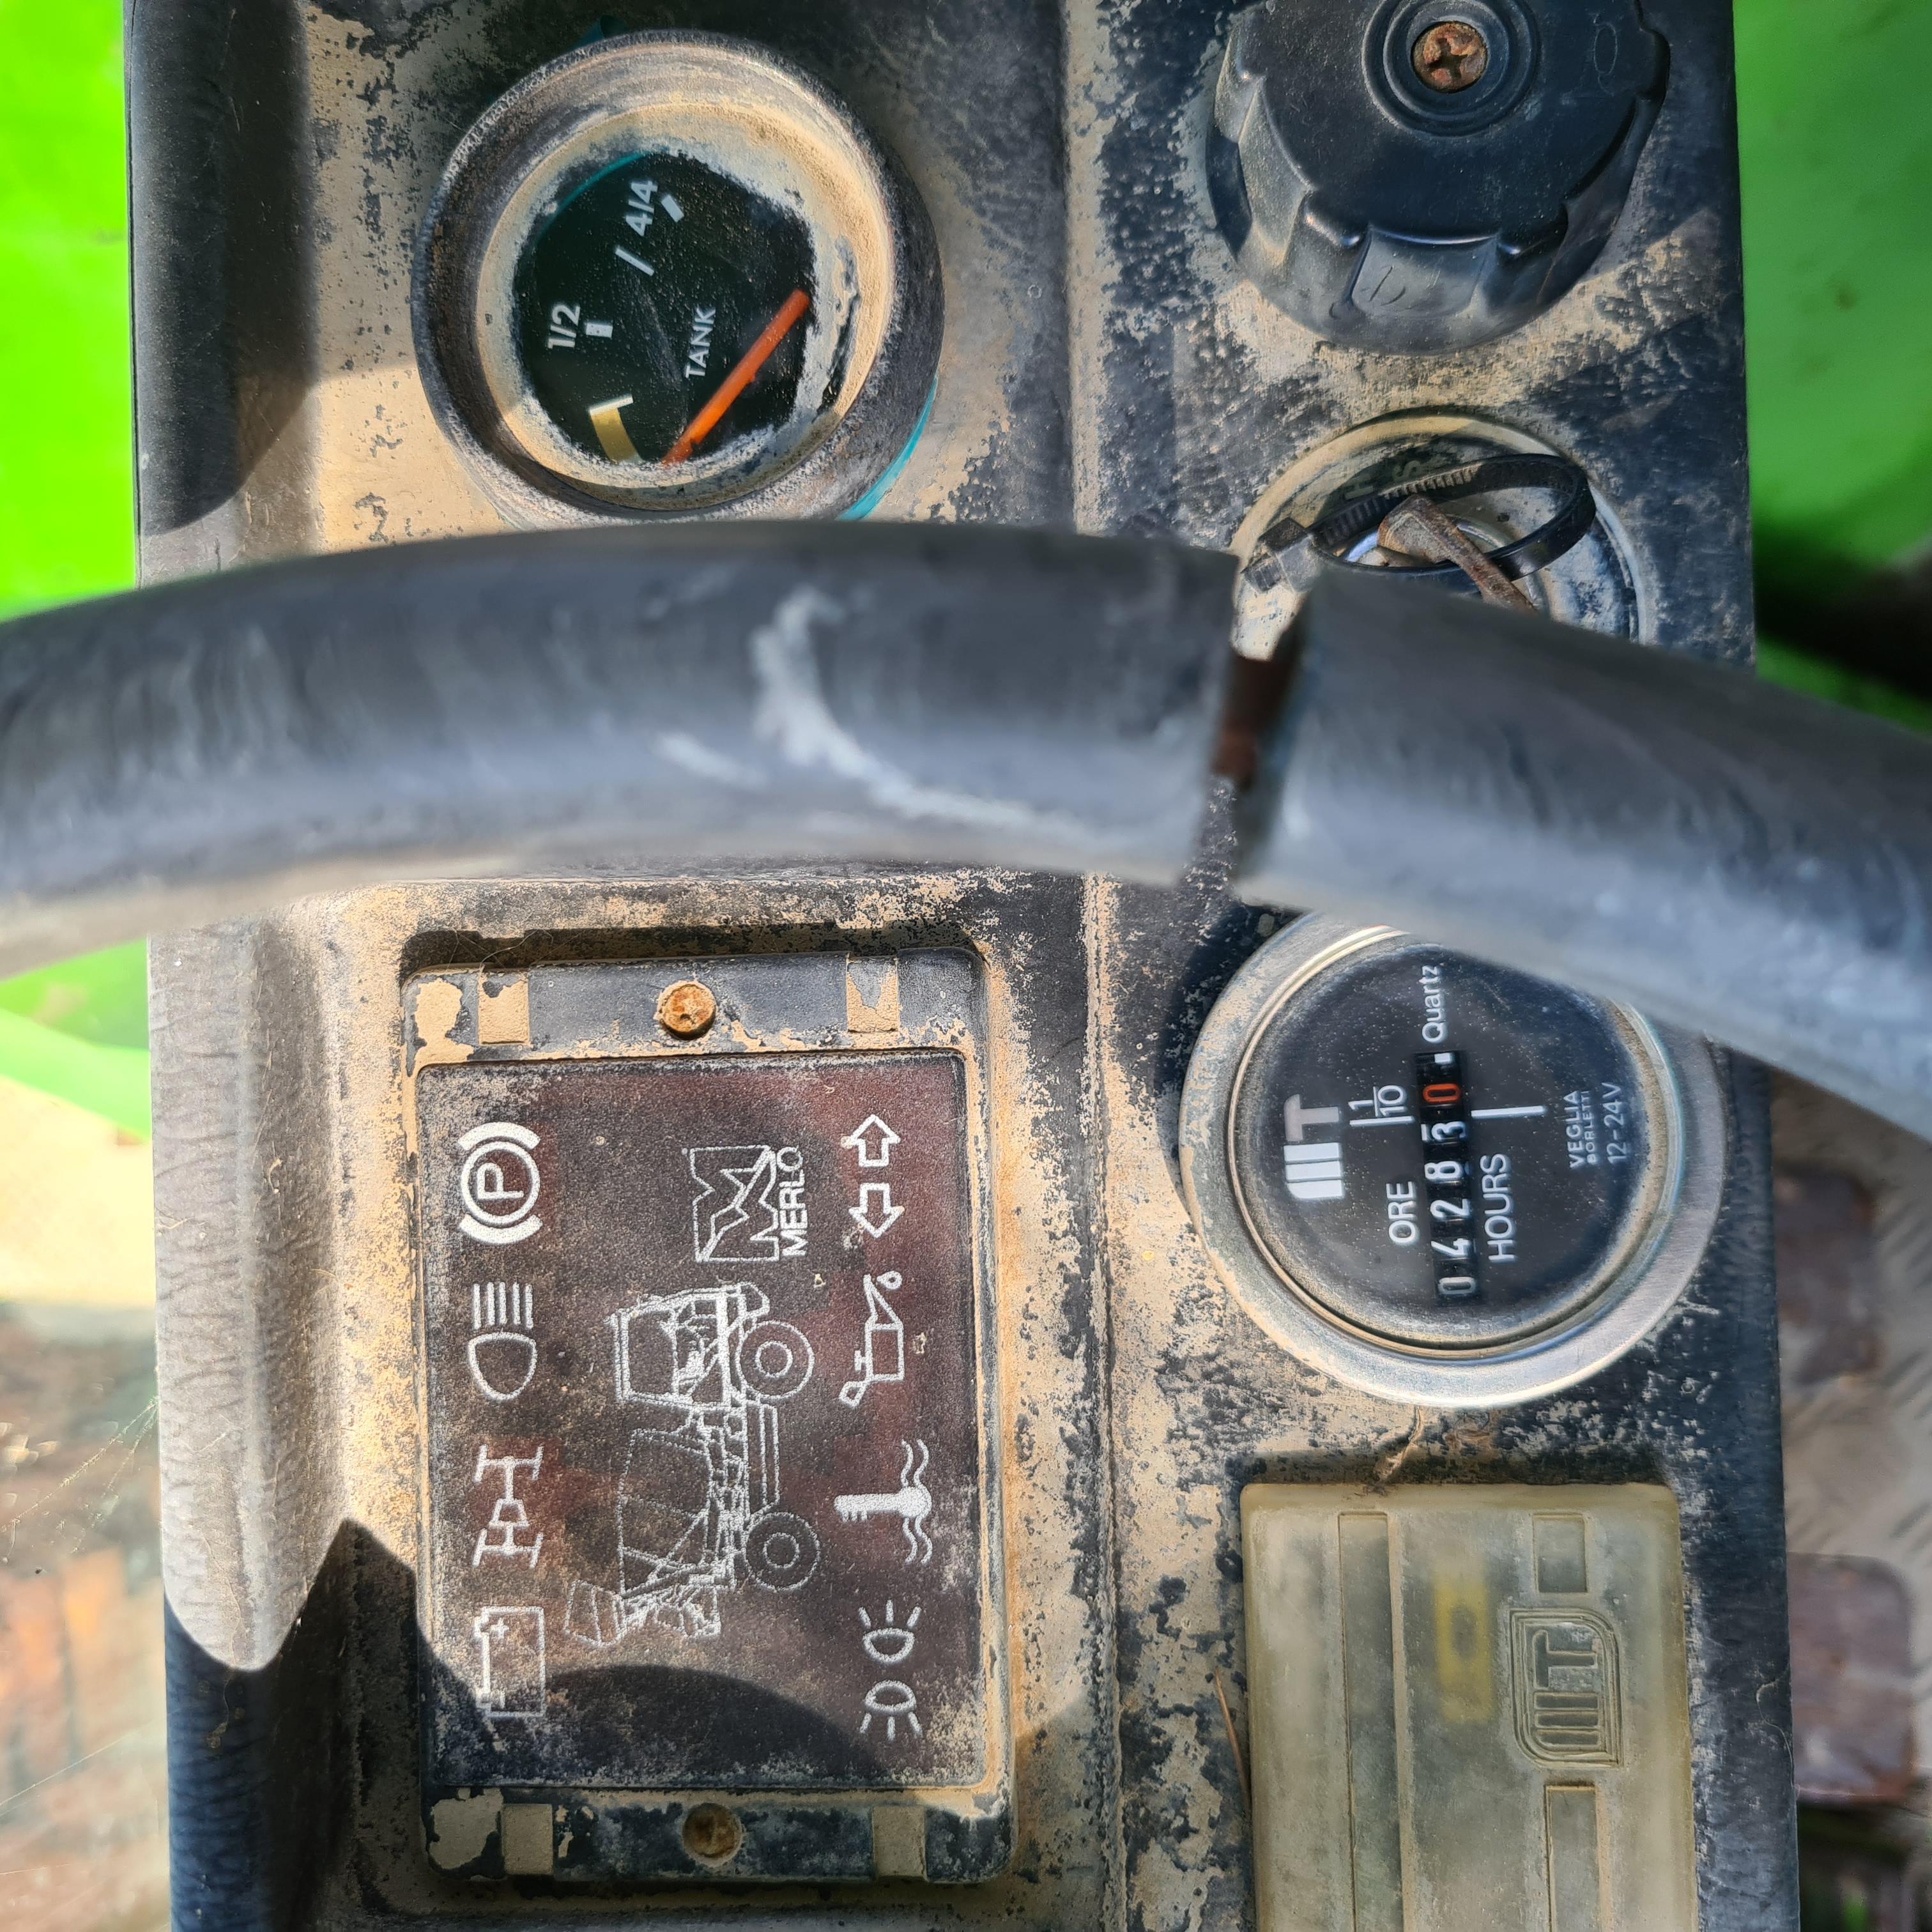 Merlo dumper betoniera dbm 2500 in vendita - foto 2